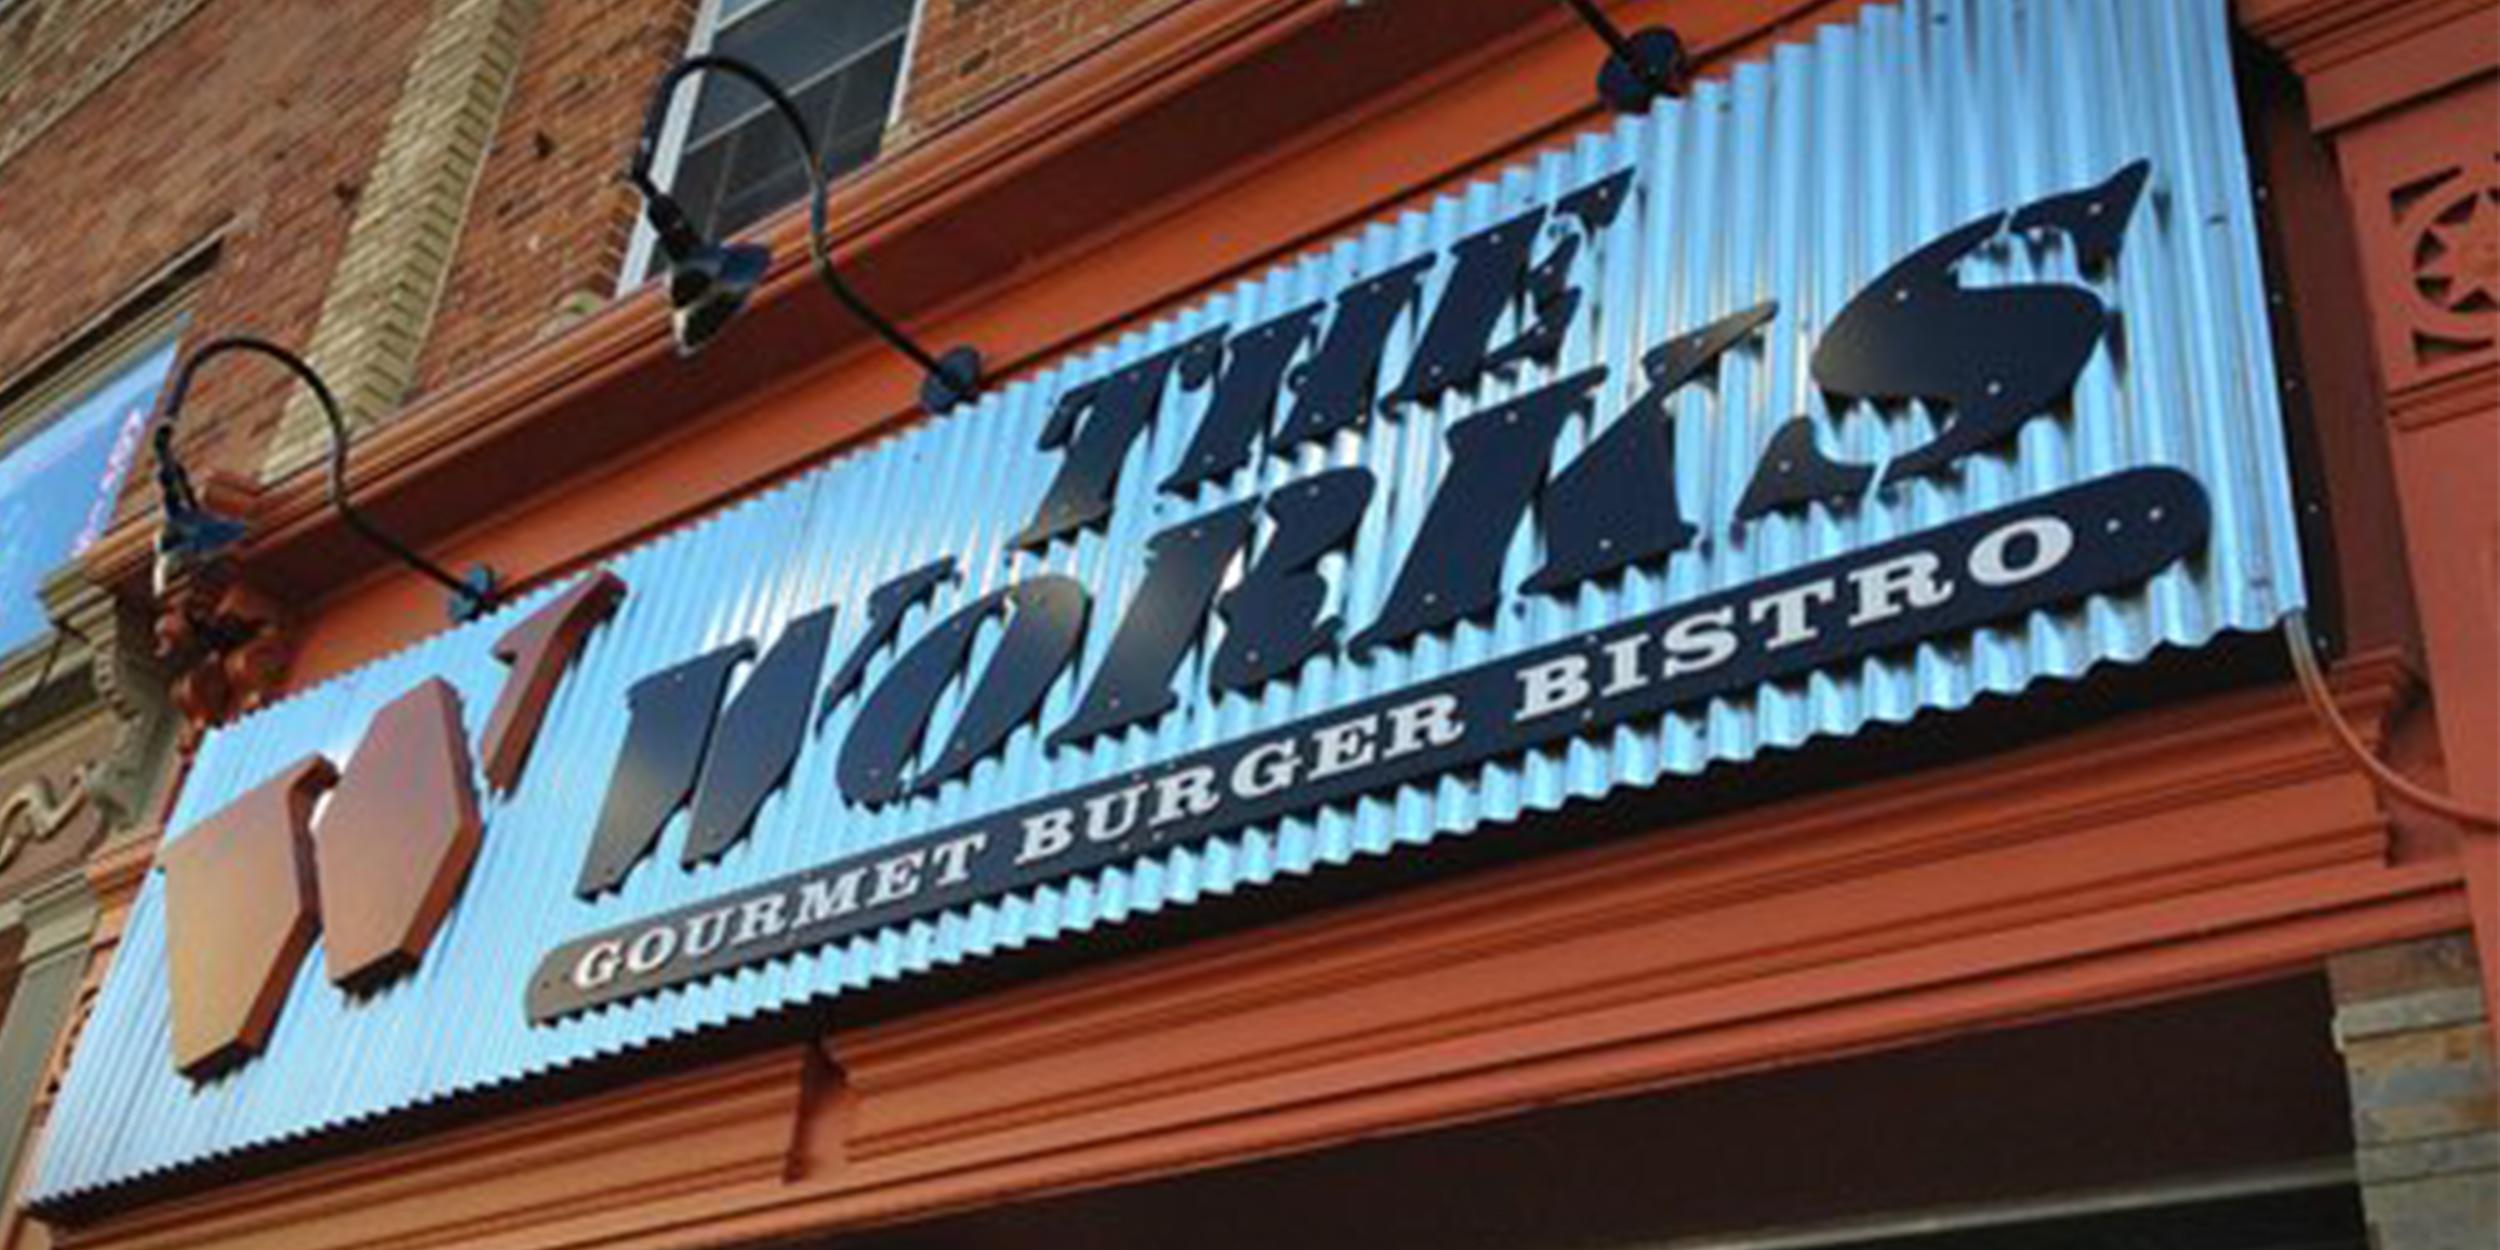 the-works-gormet-burger - edited.jpg